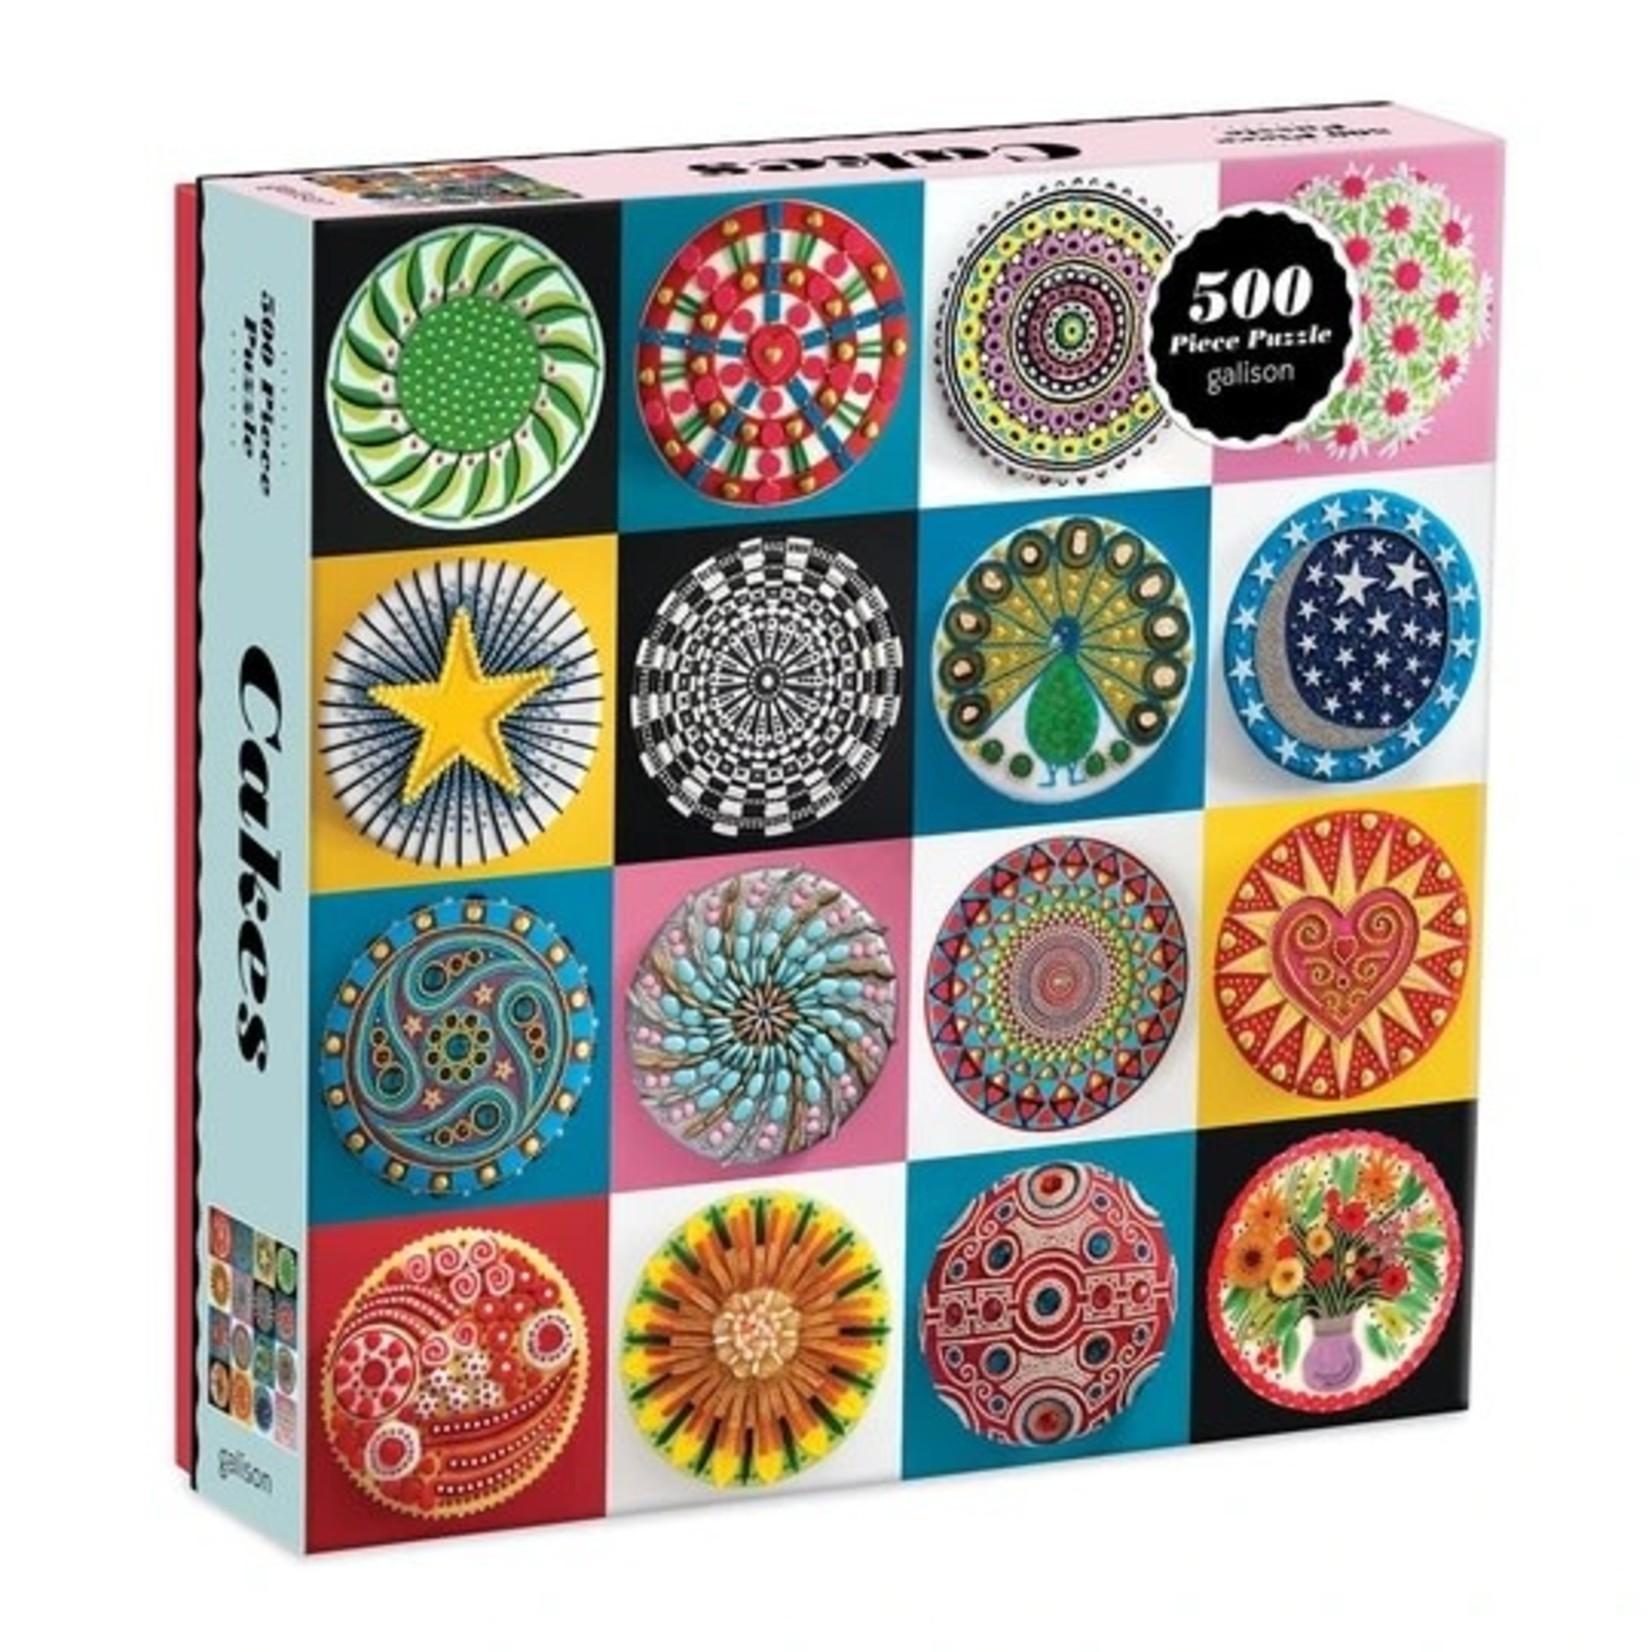 Galison Cakes - 500 Piece Jigsaw Puzzle